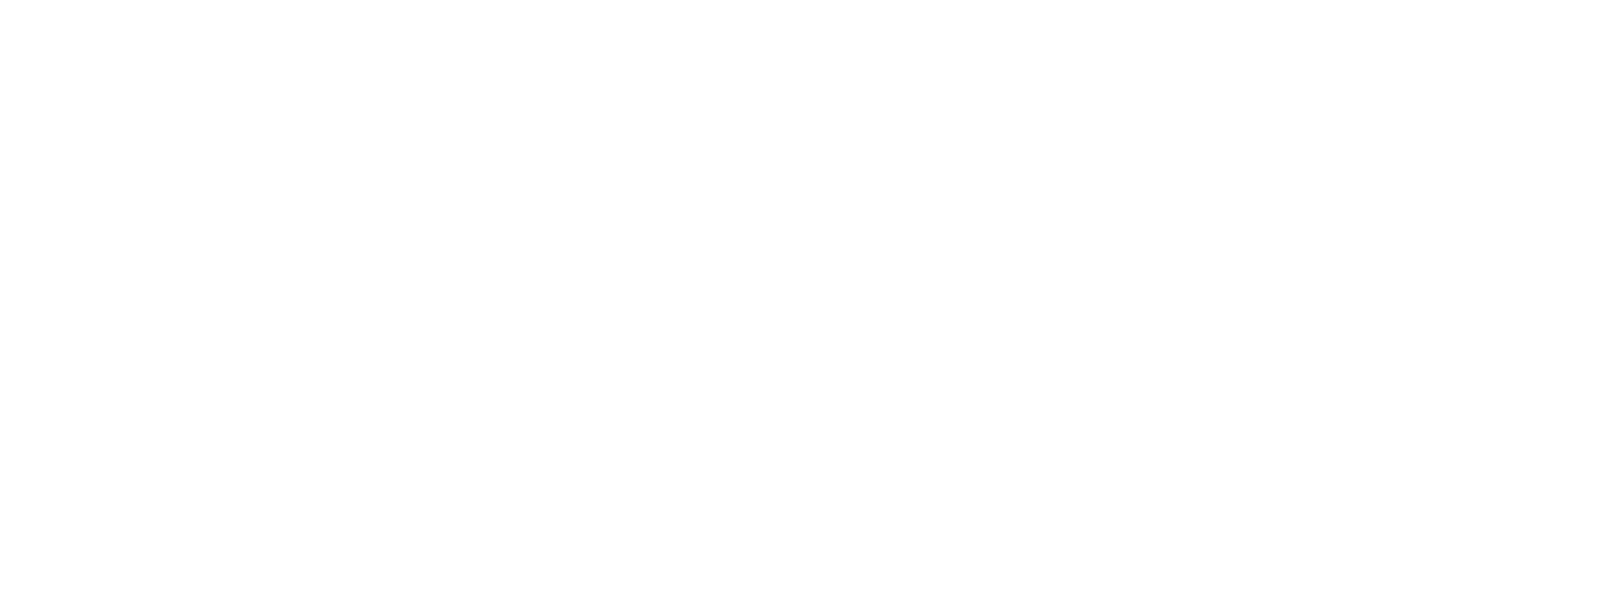 freedom-diagnostics-logo-clear-1600x600